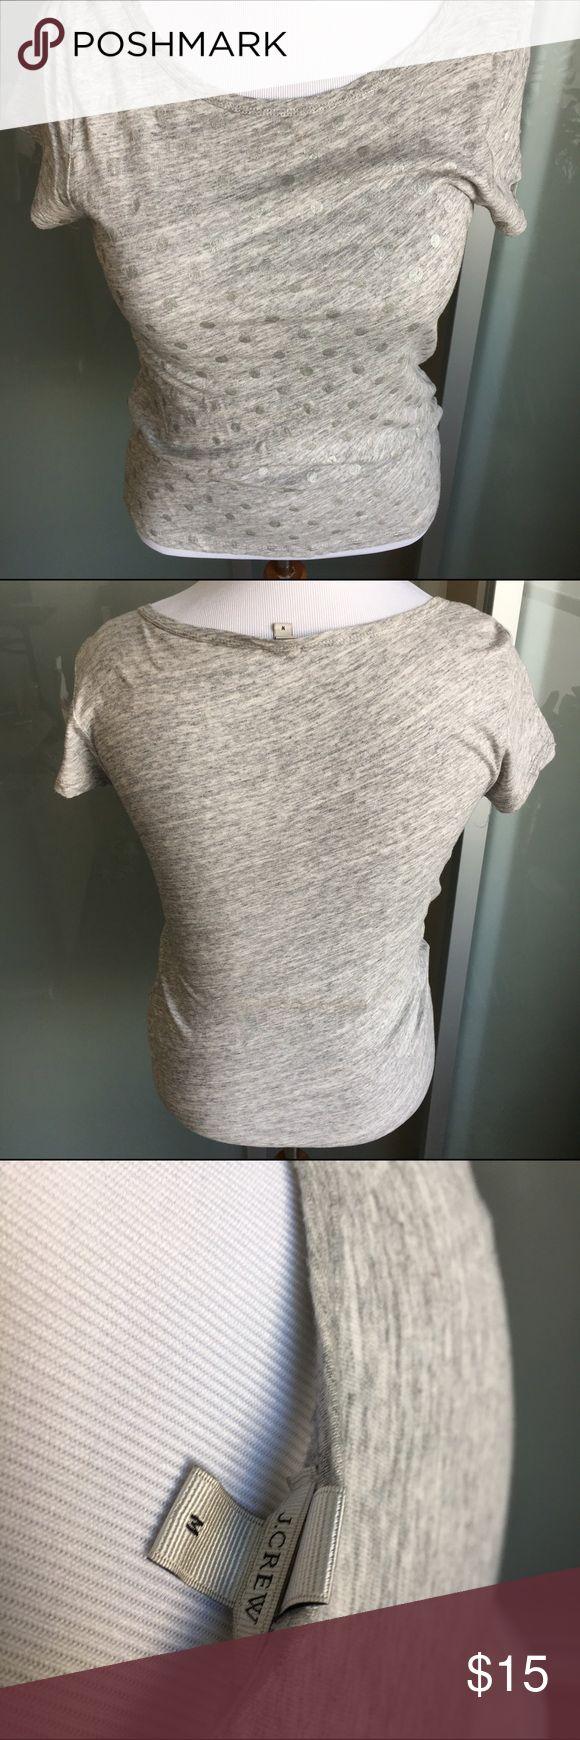 J Crew polka dot t-shirt Shirt with subtle silver polka dots J. Crew Tops Tees - Short Sleeve